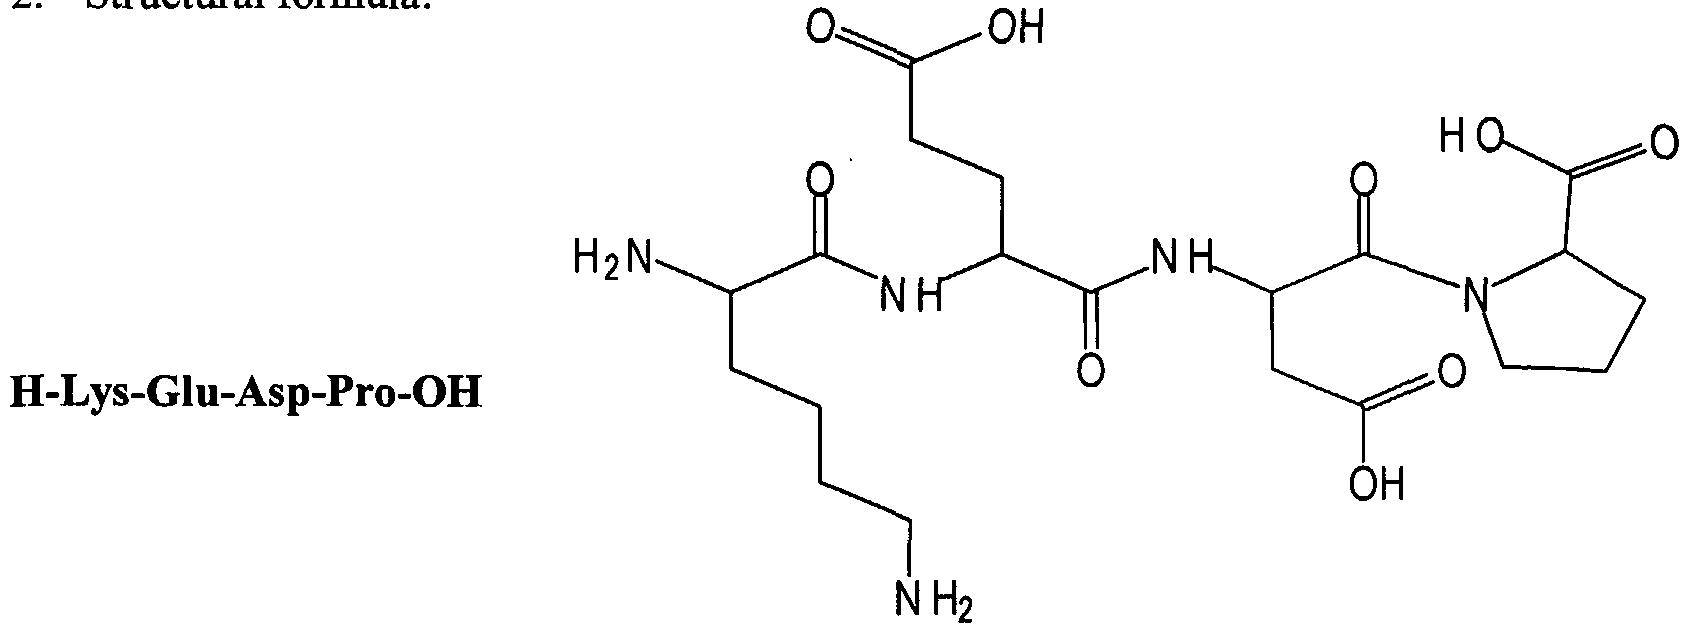 patent ep1353939a2